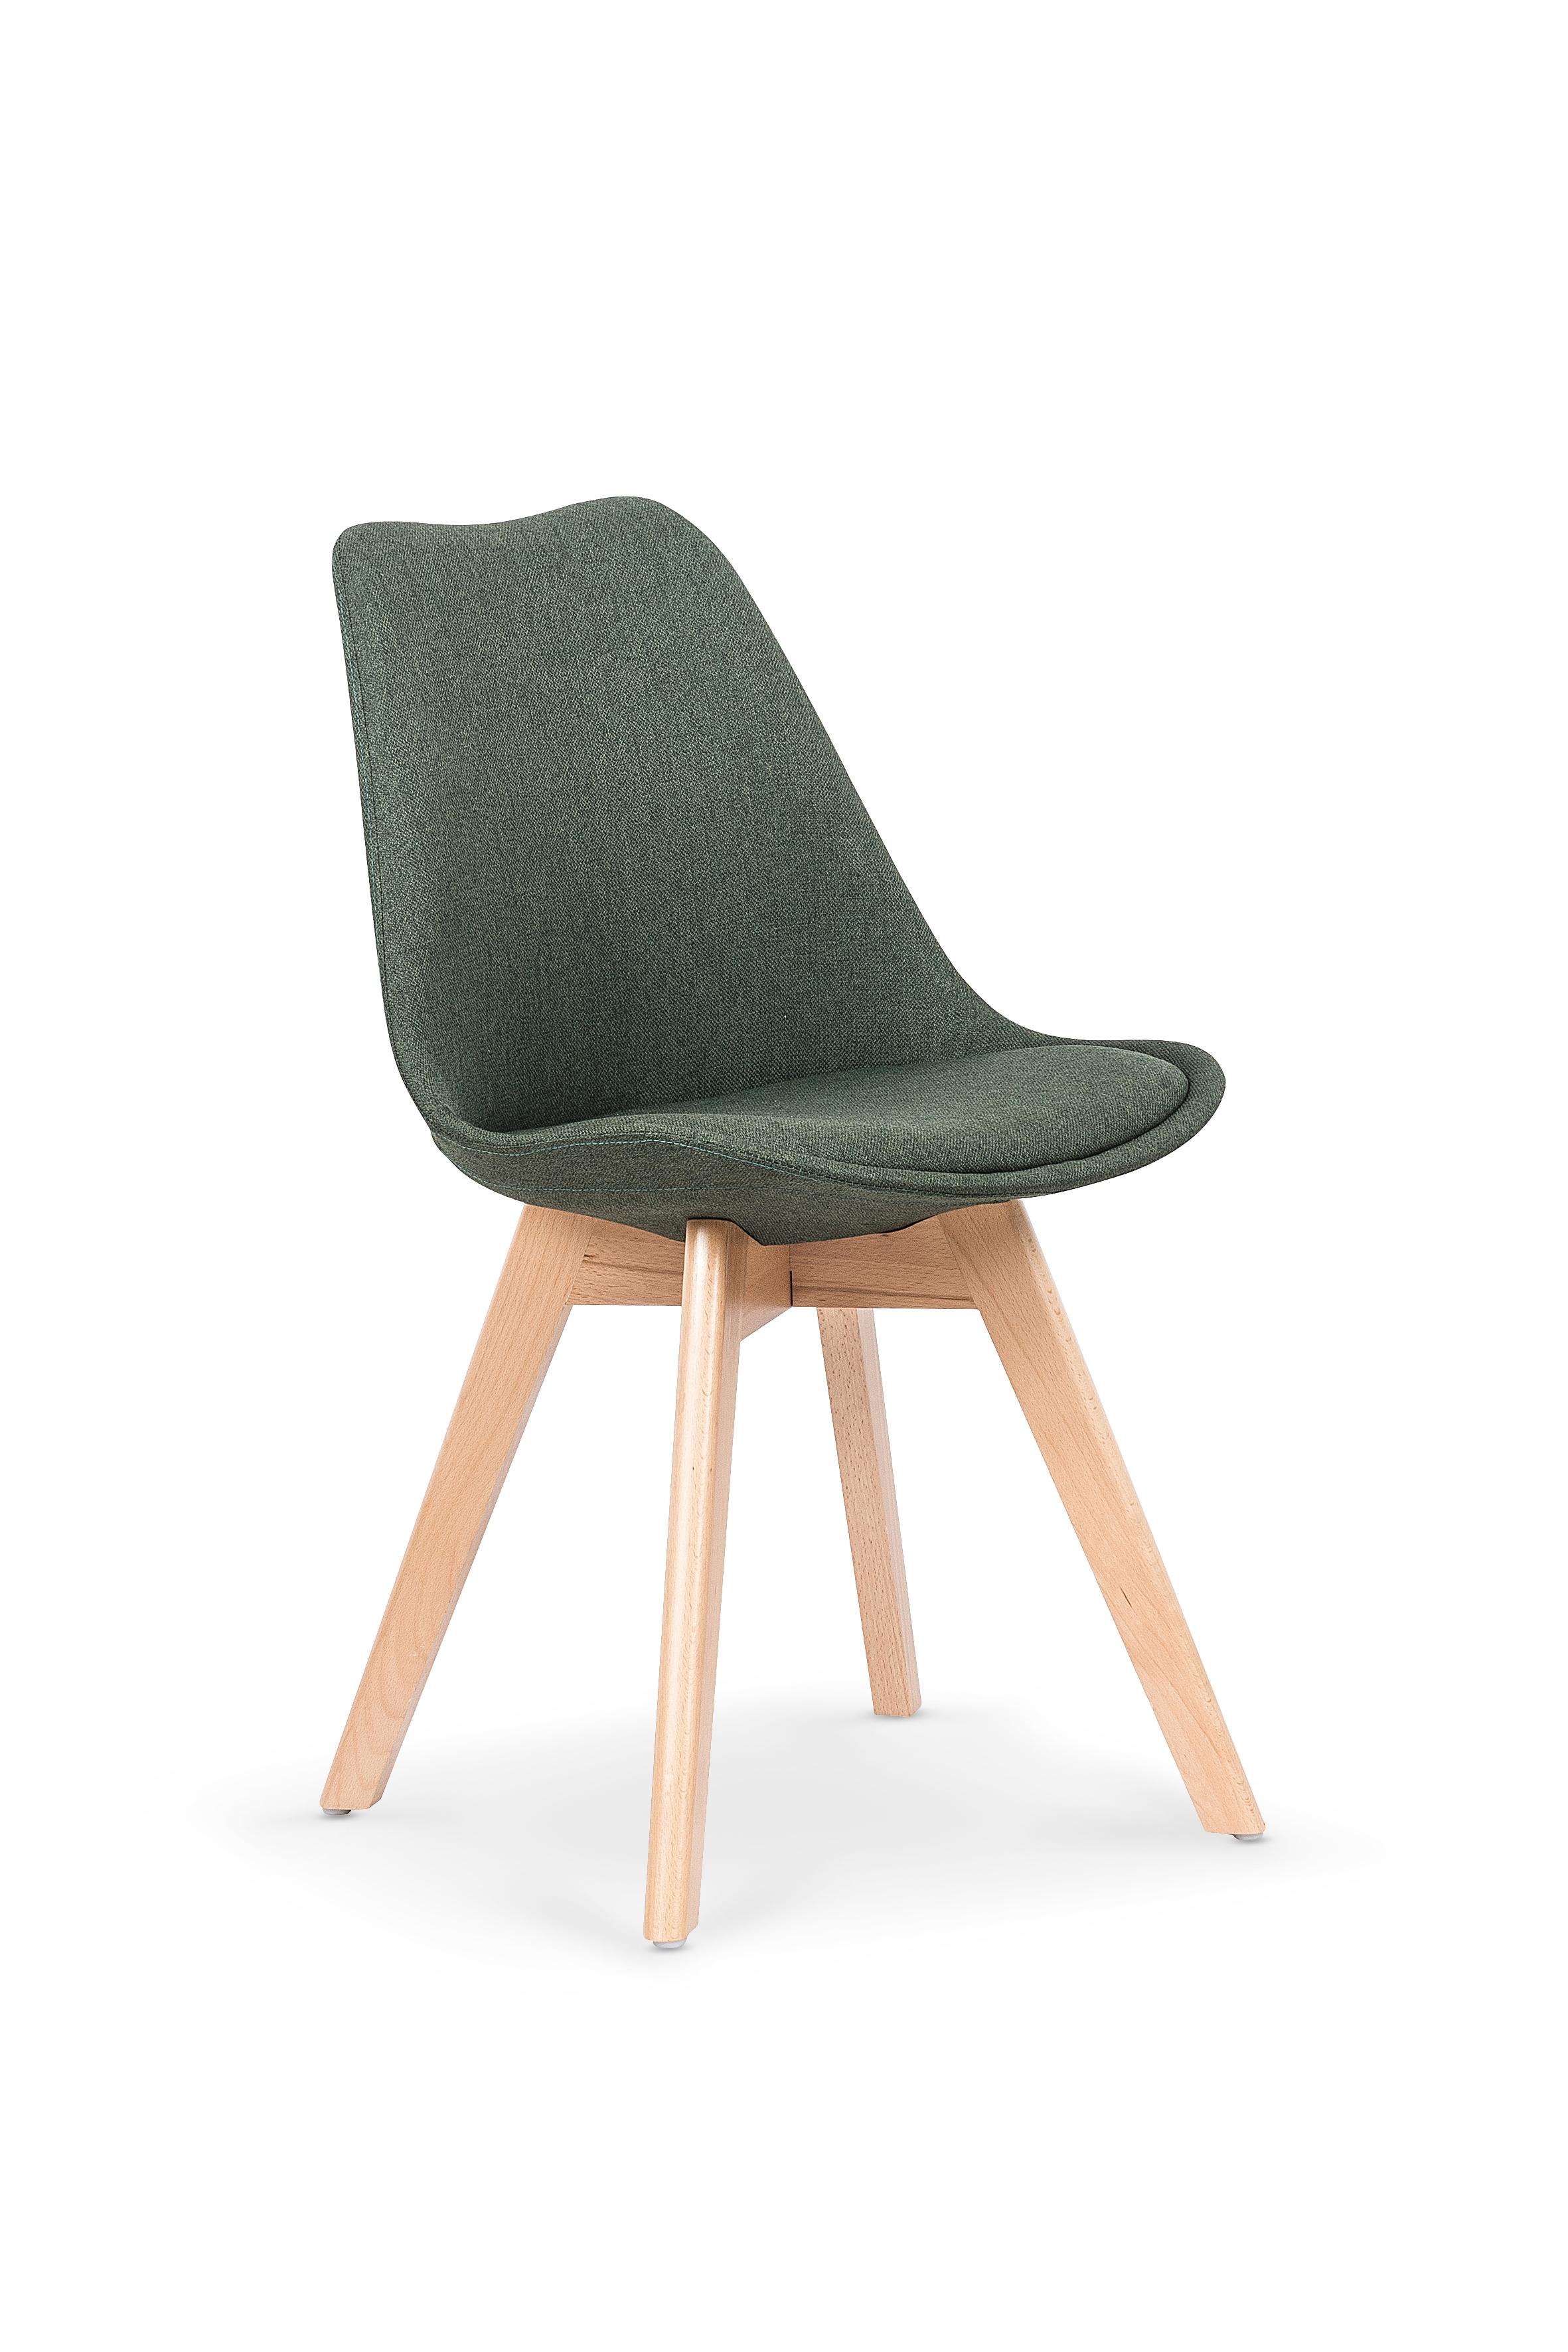 Scaun tapitat cu stofa, cu picioare din lemn K303 Dark Green, l48xA54xH83 cm imagine